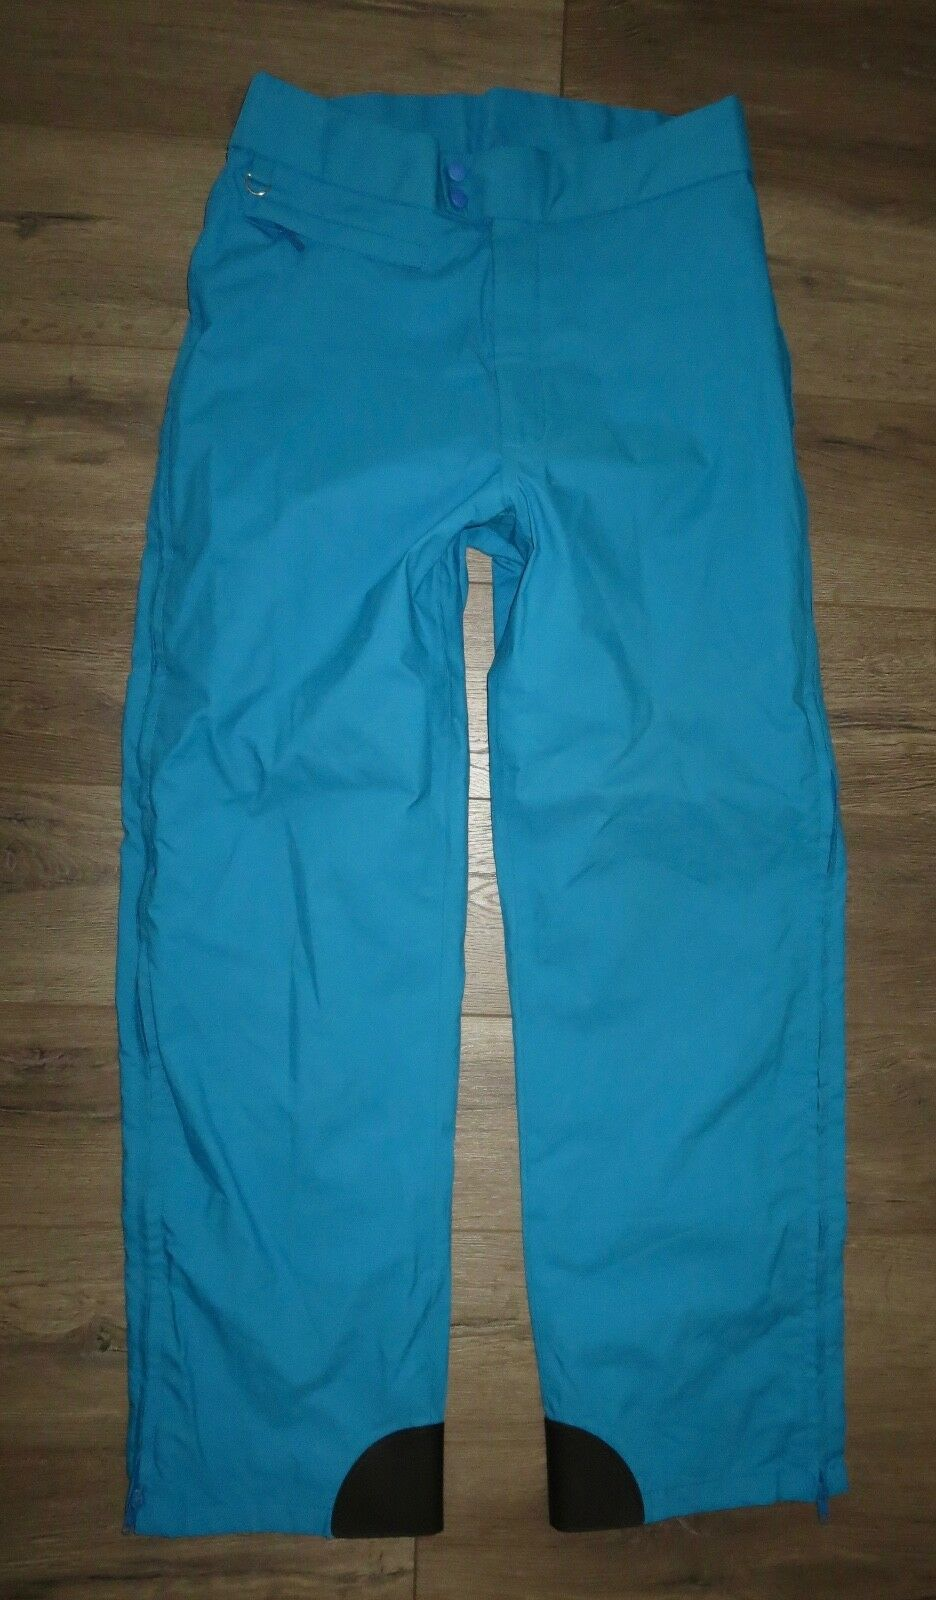 Vintage Uomo SPORTIF Gore-Tex Waterproof Full Side Zip Zip Side Snowboard Ski Pants 32 6e1a11